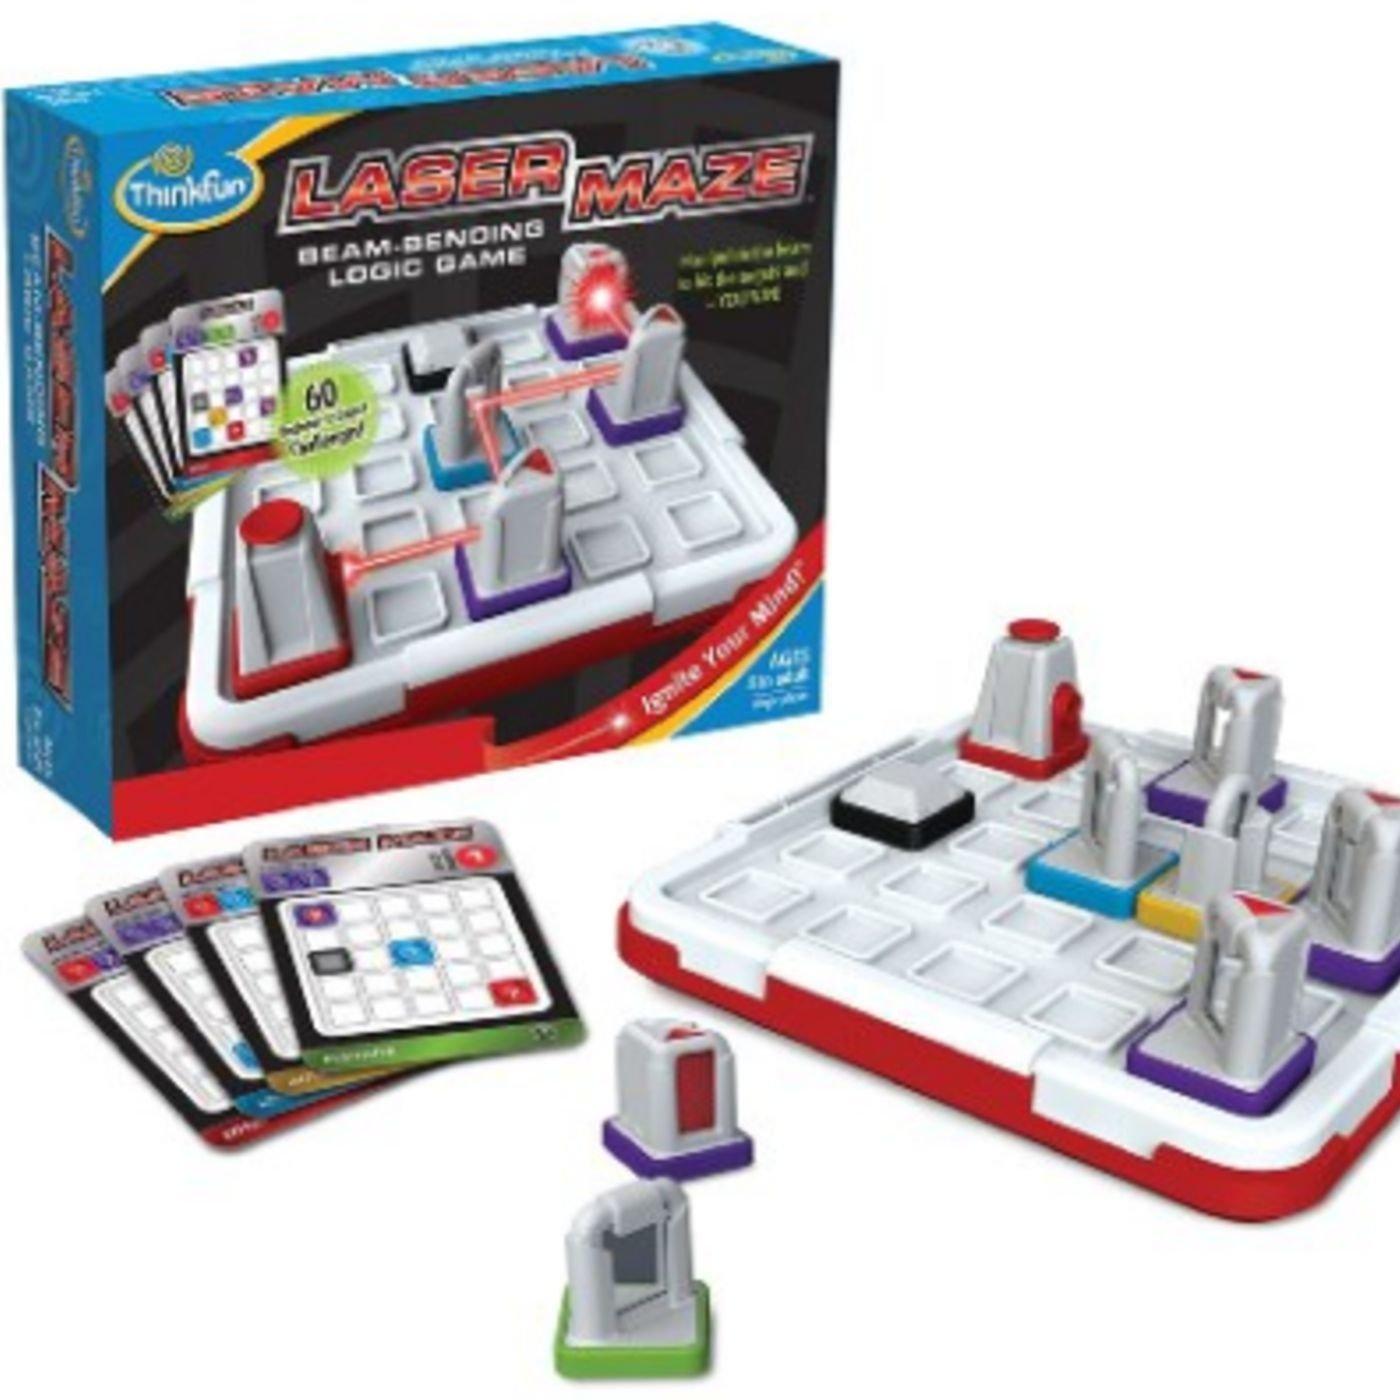 10 Elegant Gift Ideas For Boys Age 7 cool christmas gift ideas for boys age 7 8 logic games 2020